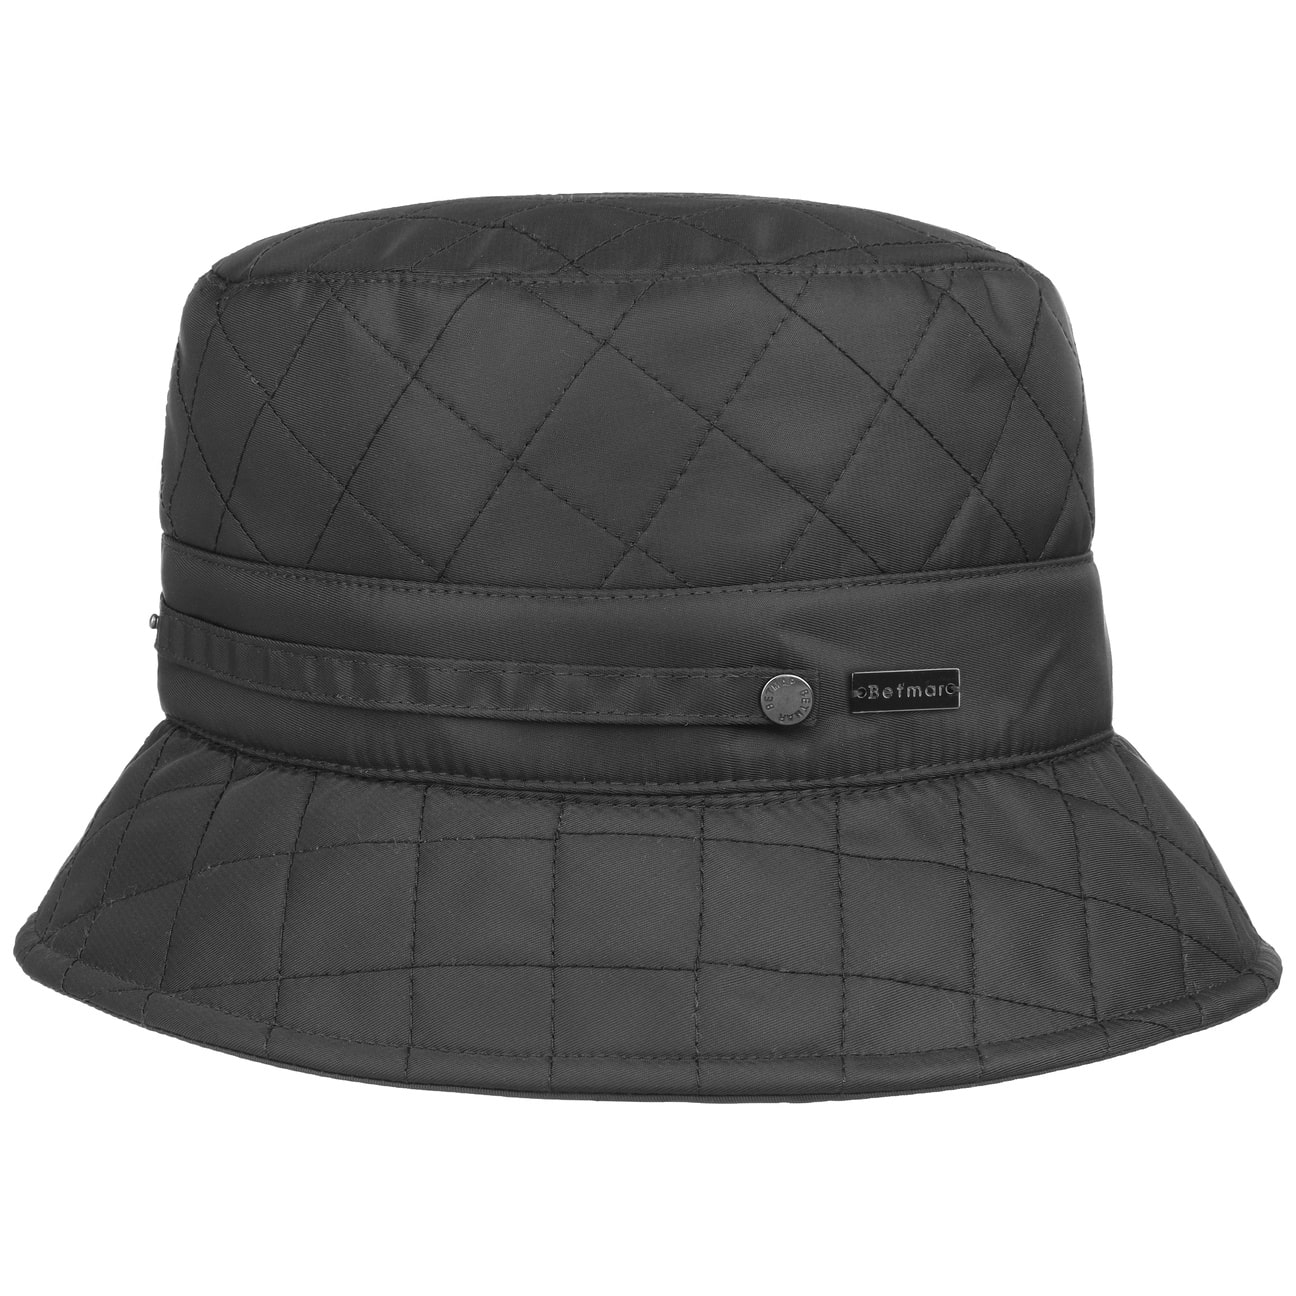 Sombrero de Mujer Quilted Bucket by Betmar  sombrero de lluvia